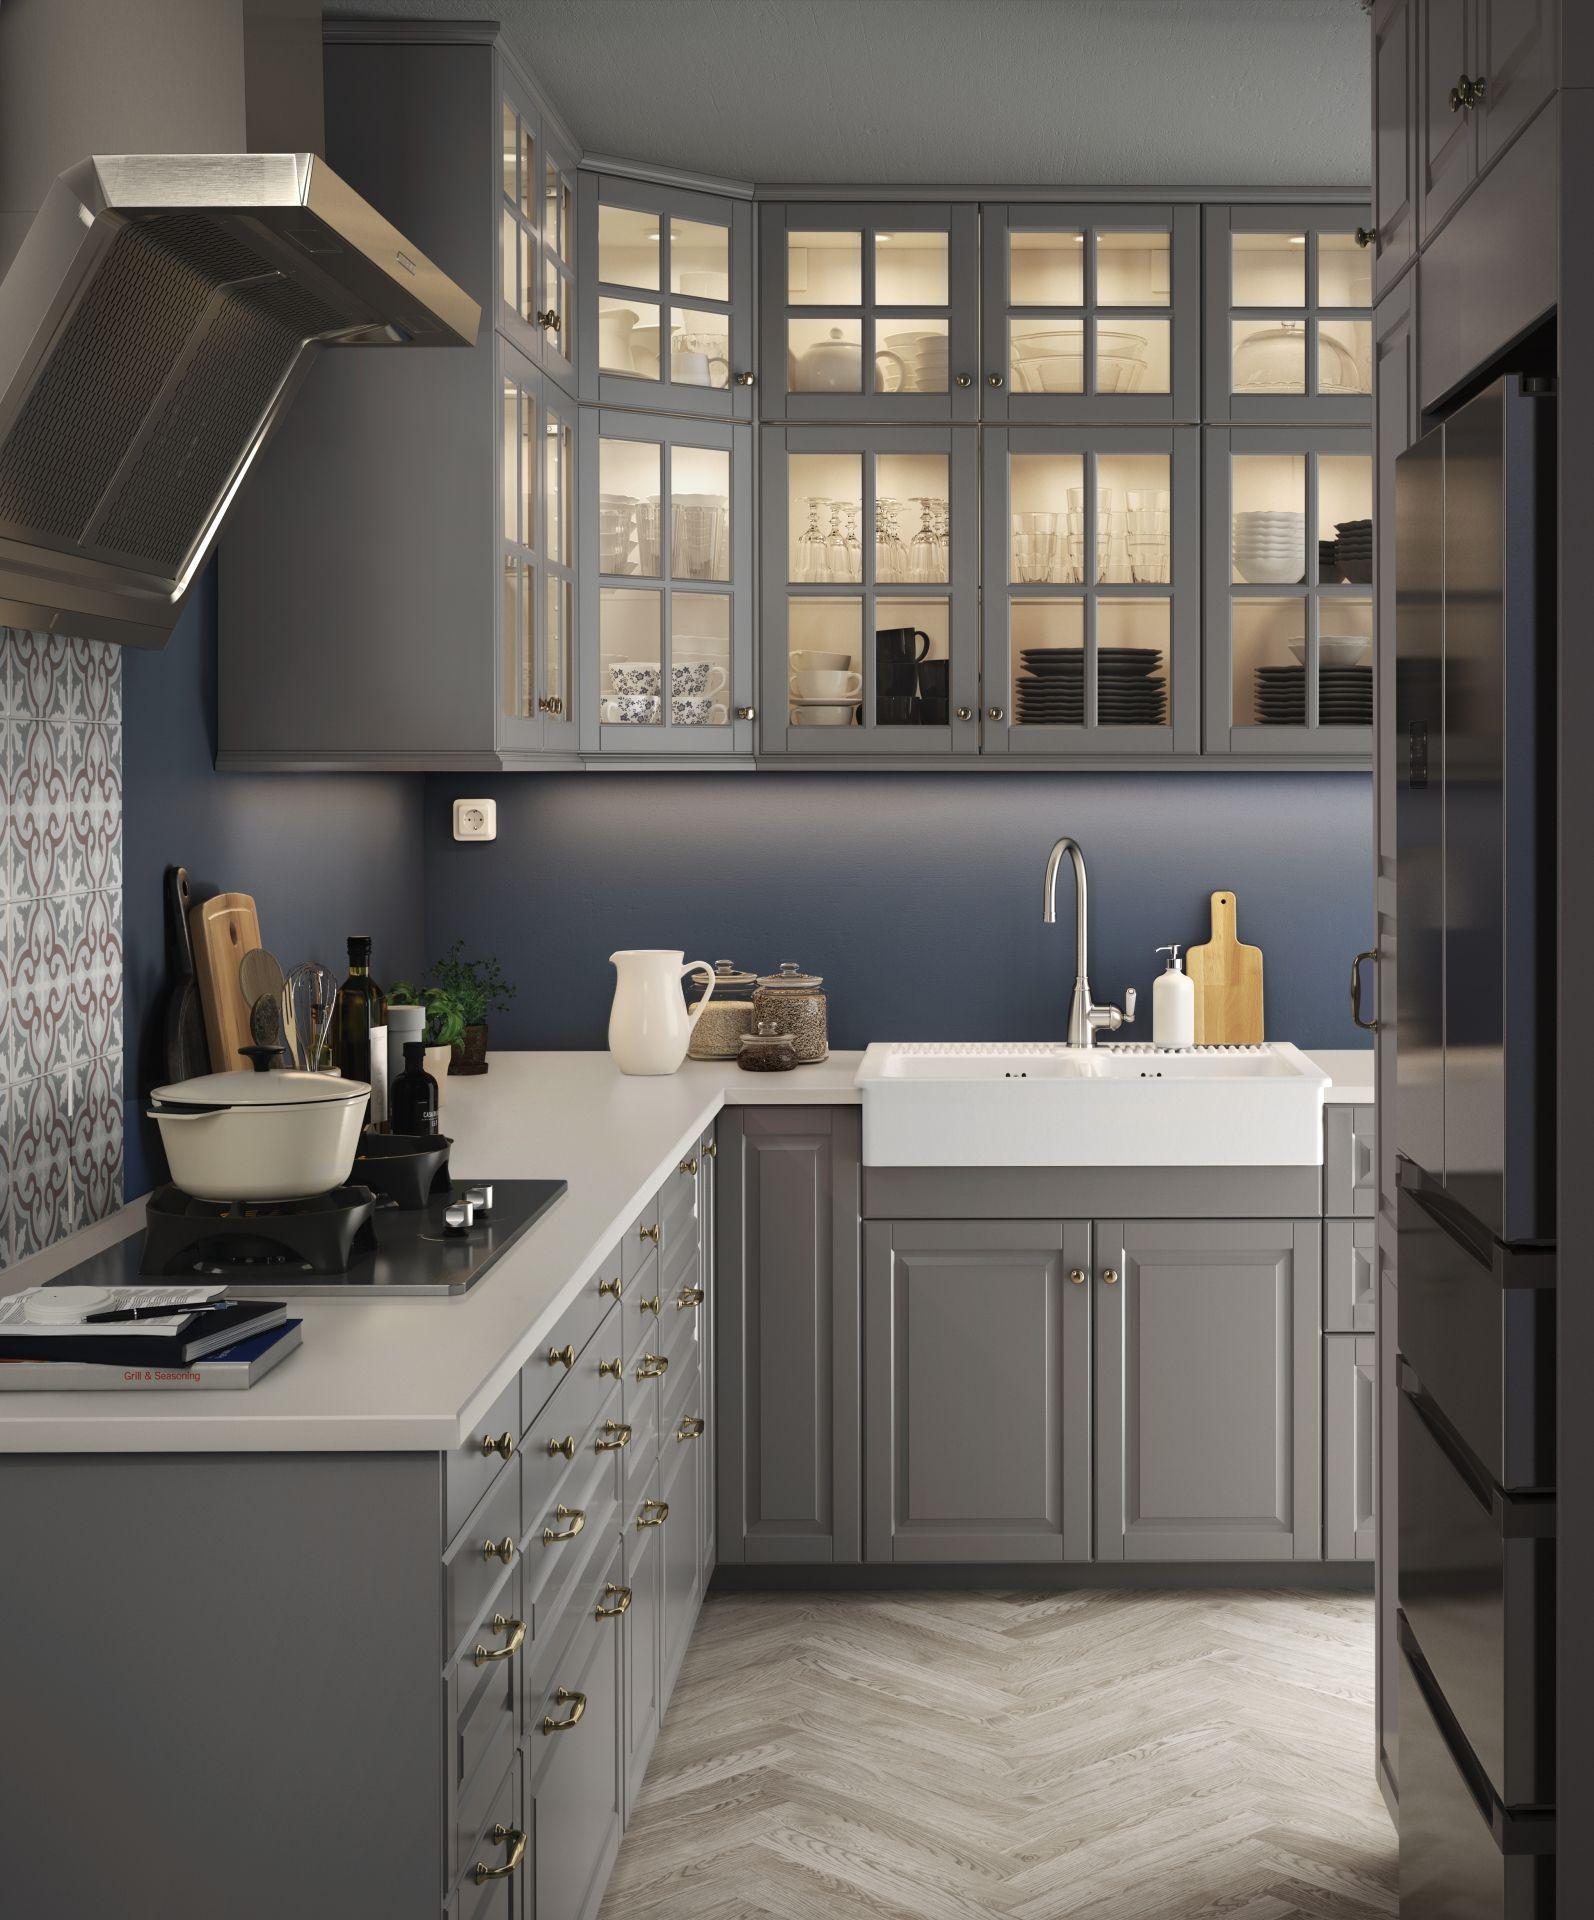 Bodbyn Deur Grijs 60x80 Cm Ikea Keuken Ontwerpen Keuken Inspiratie Keuken Interieur